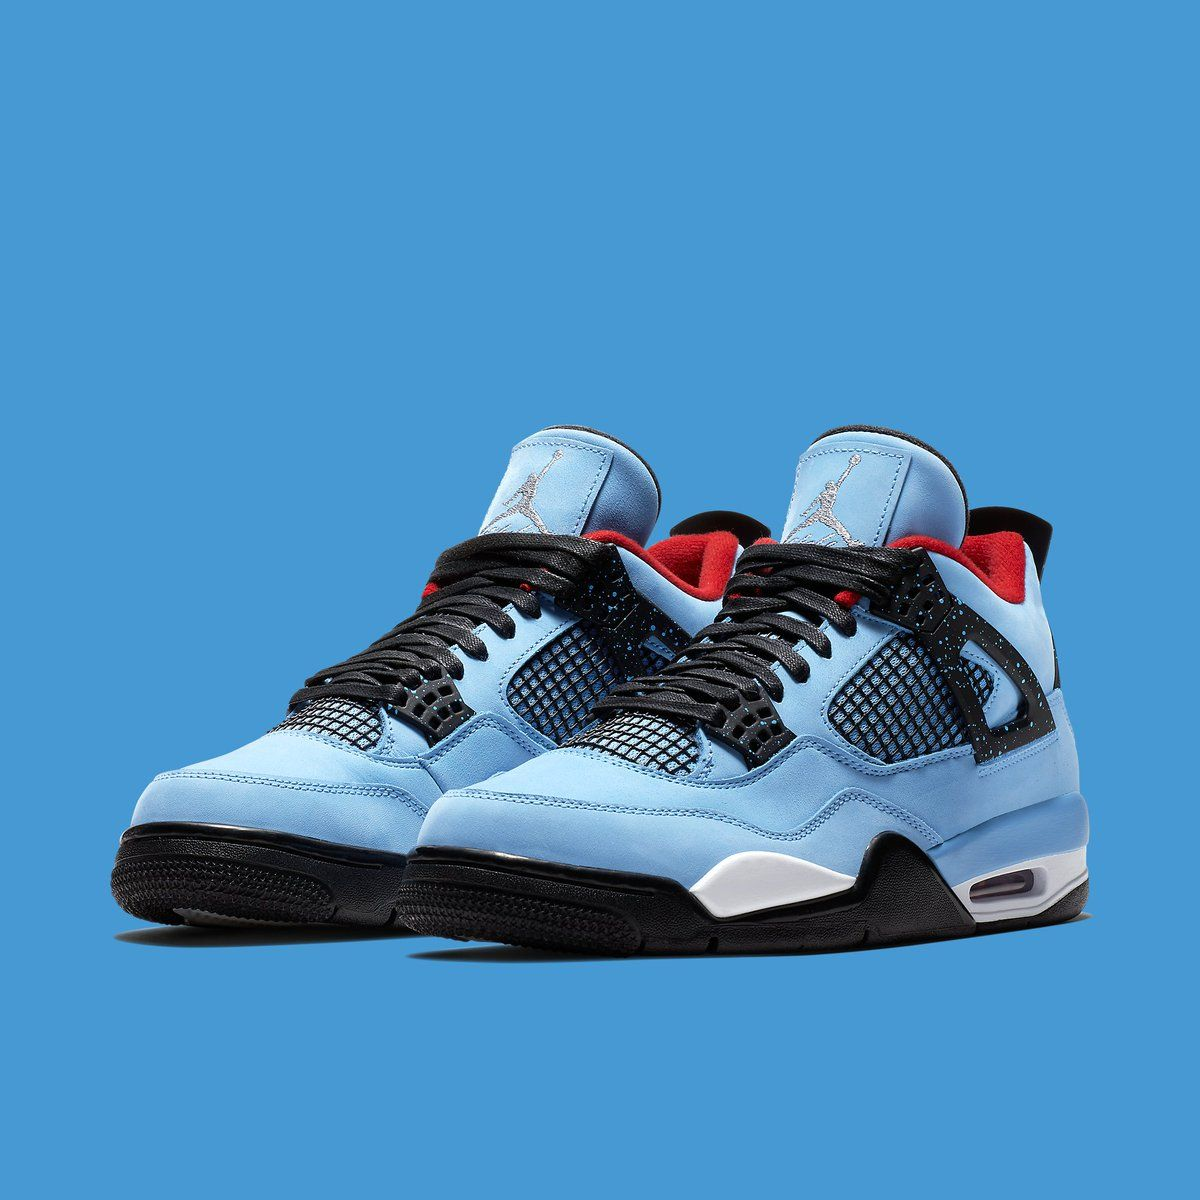 quality design 14b71 b2c65 The trvisXX x Air Jordan 4